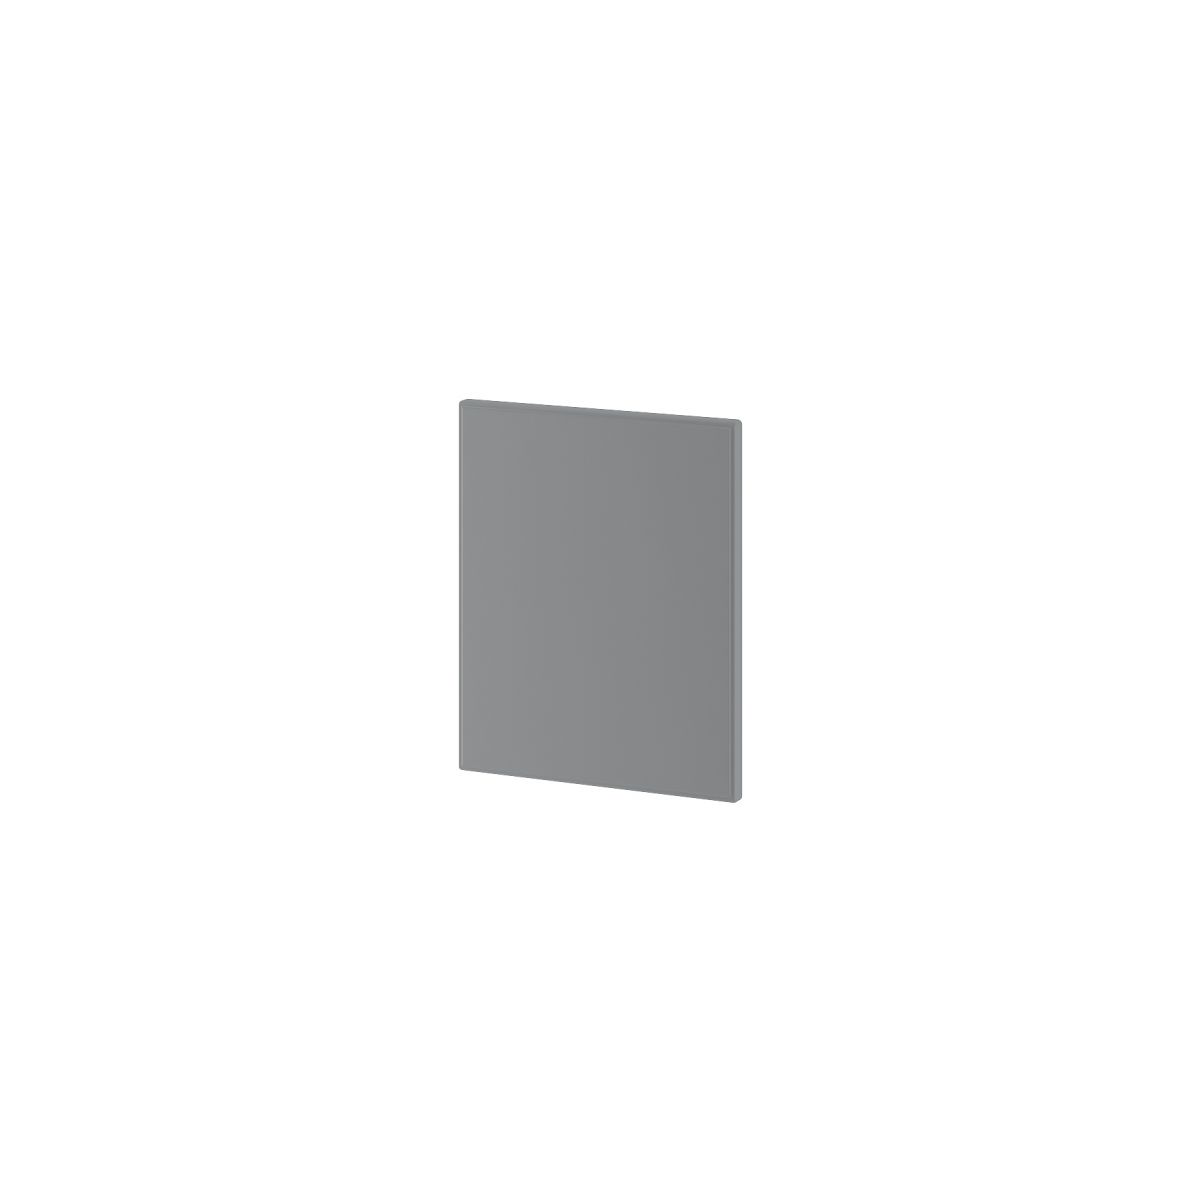 LAYMAN - LORA Panel 36/30 panel boczny szafka górna